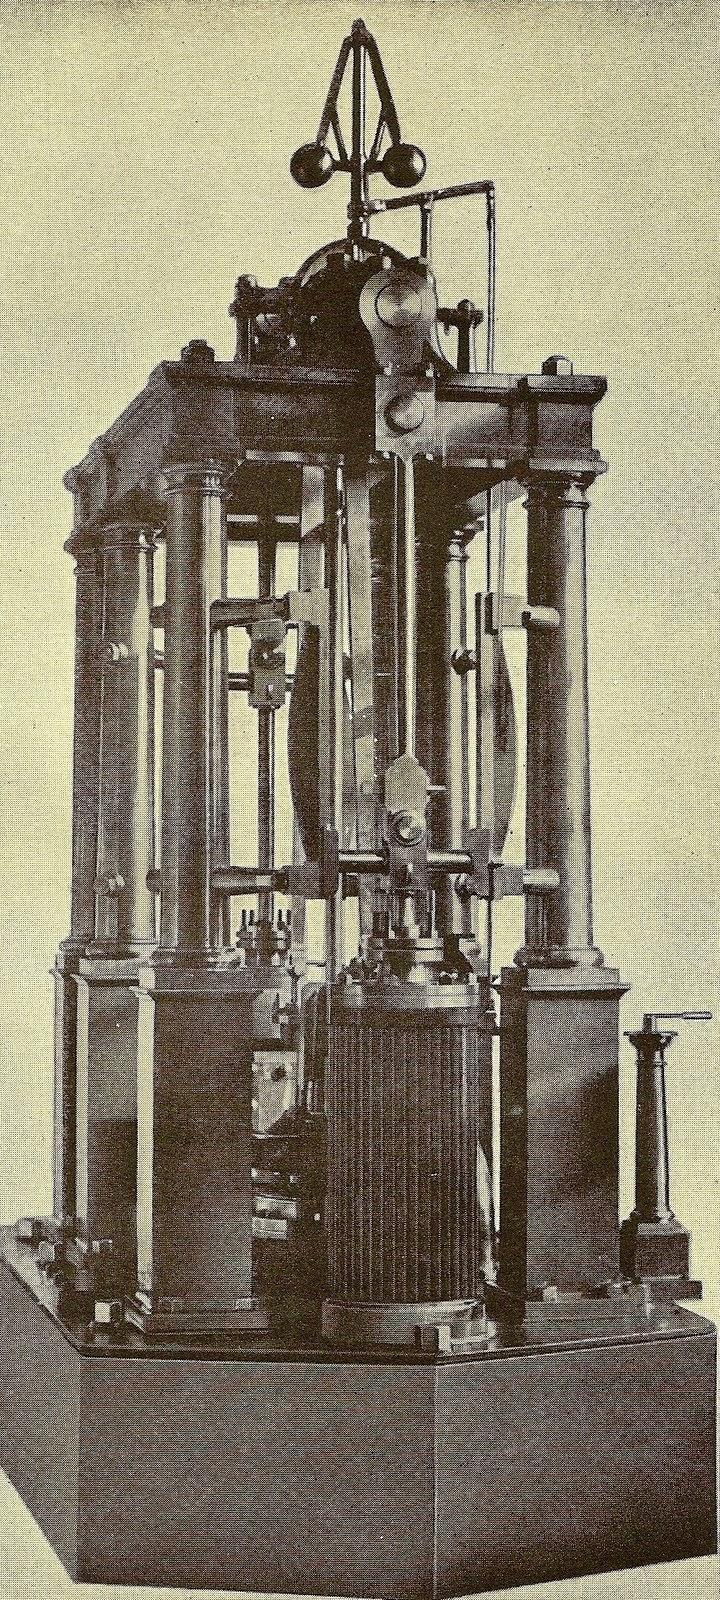 Modelo de máquina de vapor fabricado por William Wain en 1860.jpg